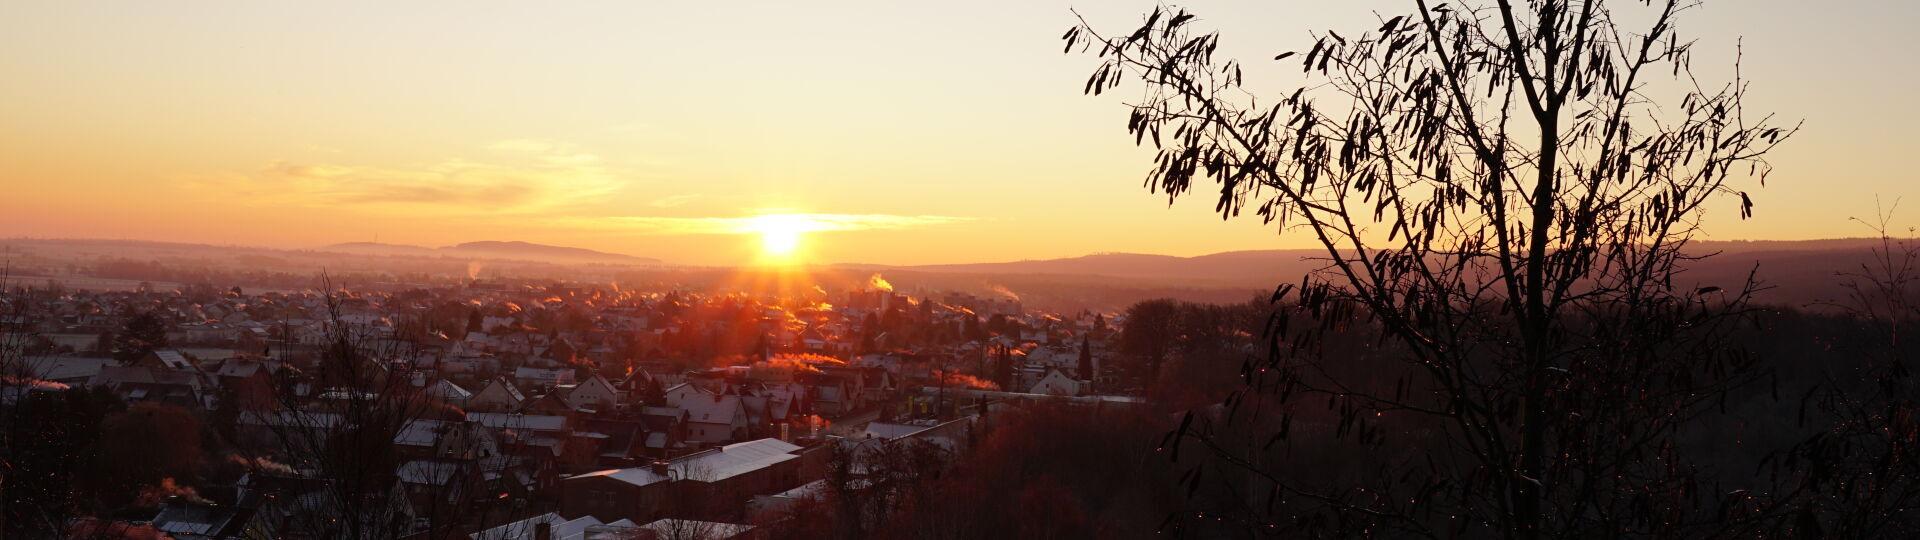 Sonnenaufgang über Barsinghausen